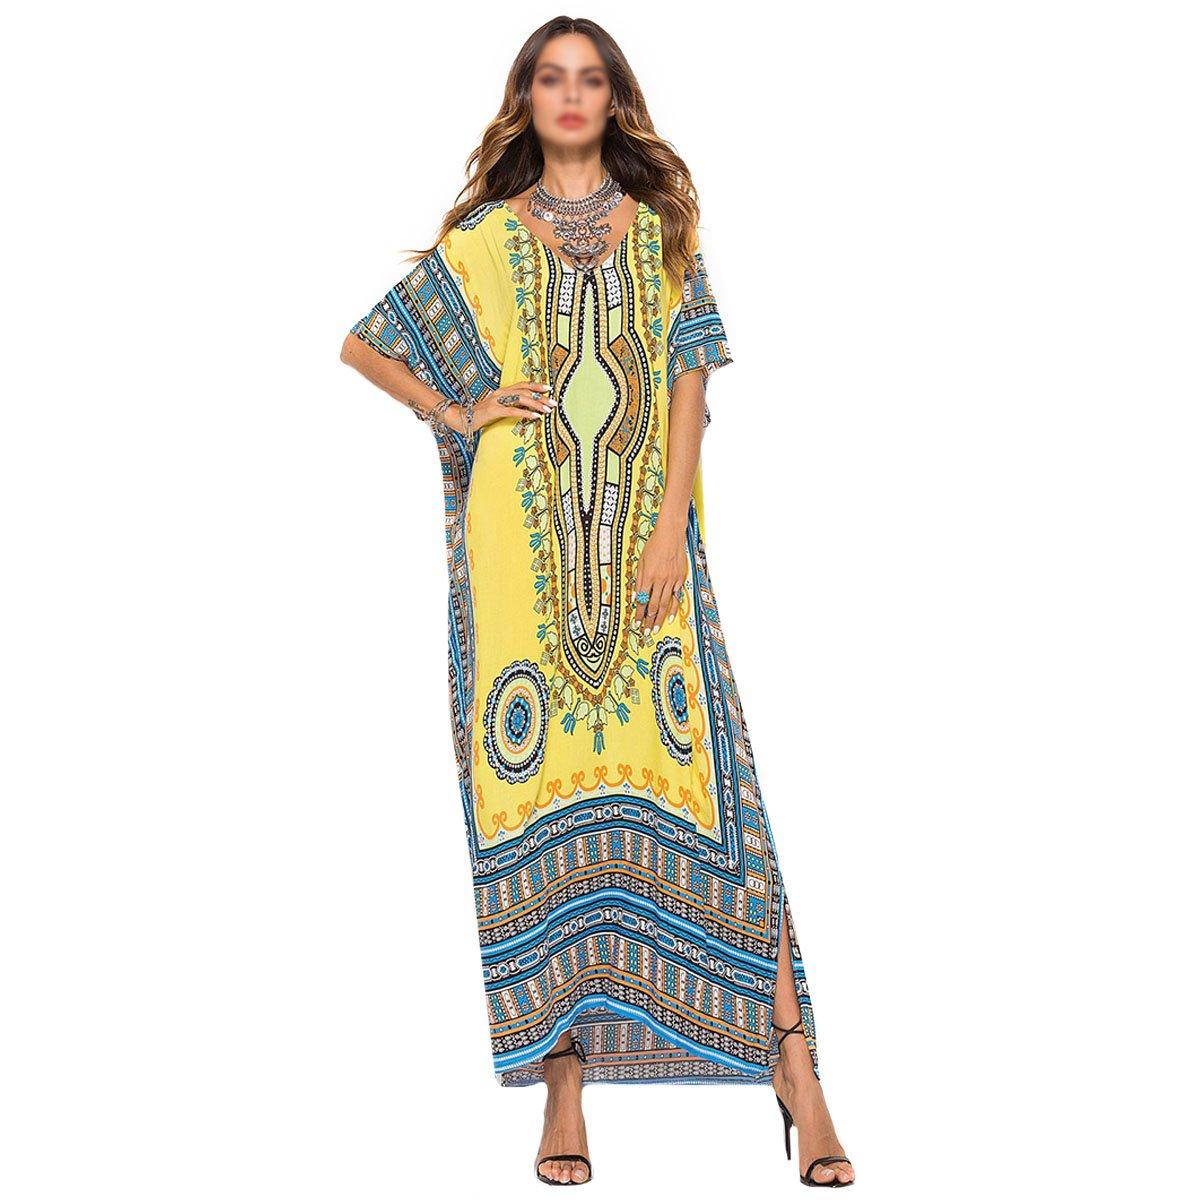 Monique Women's African Floral Print Maxi Long Dress Casual Bat Sleeves Full Dress Summer Beach Cover up 2746 Yellow